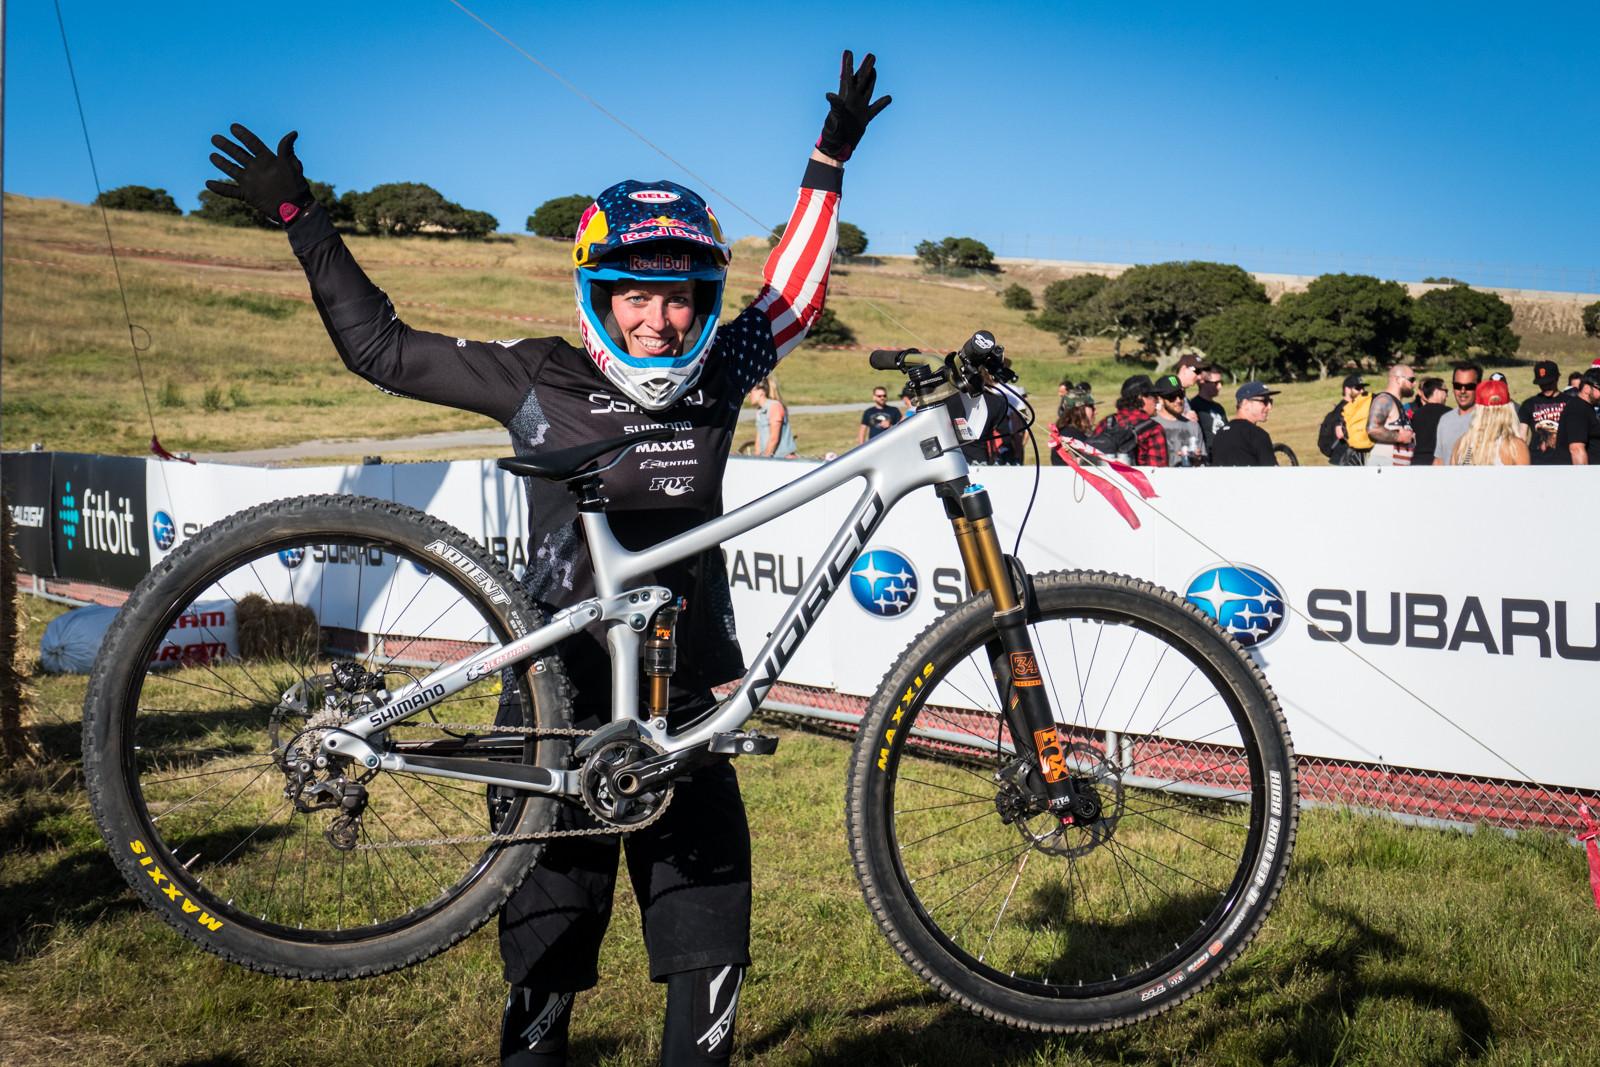 WINNING BIKE - Jill Kintner's Norco Optic Carbon 7 - WINNING BIKE - Jill Kintner's Norco Optic Carbon 7 - Mountain Biking Pictures - Vital MTB